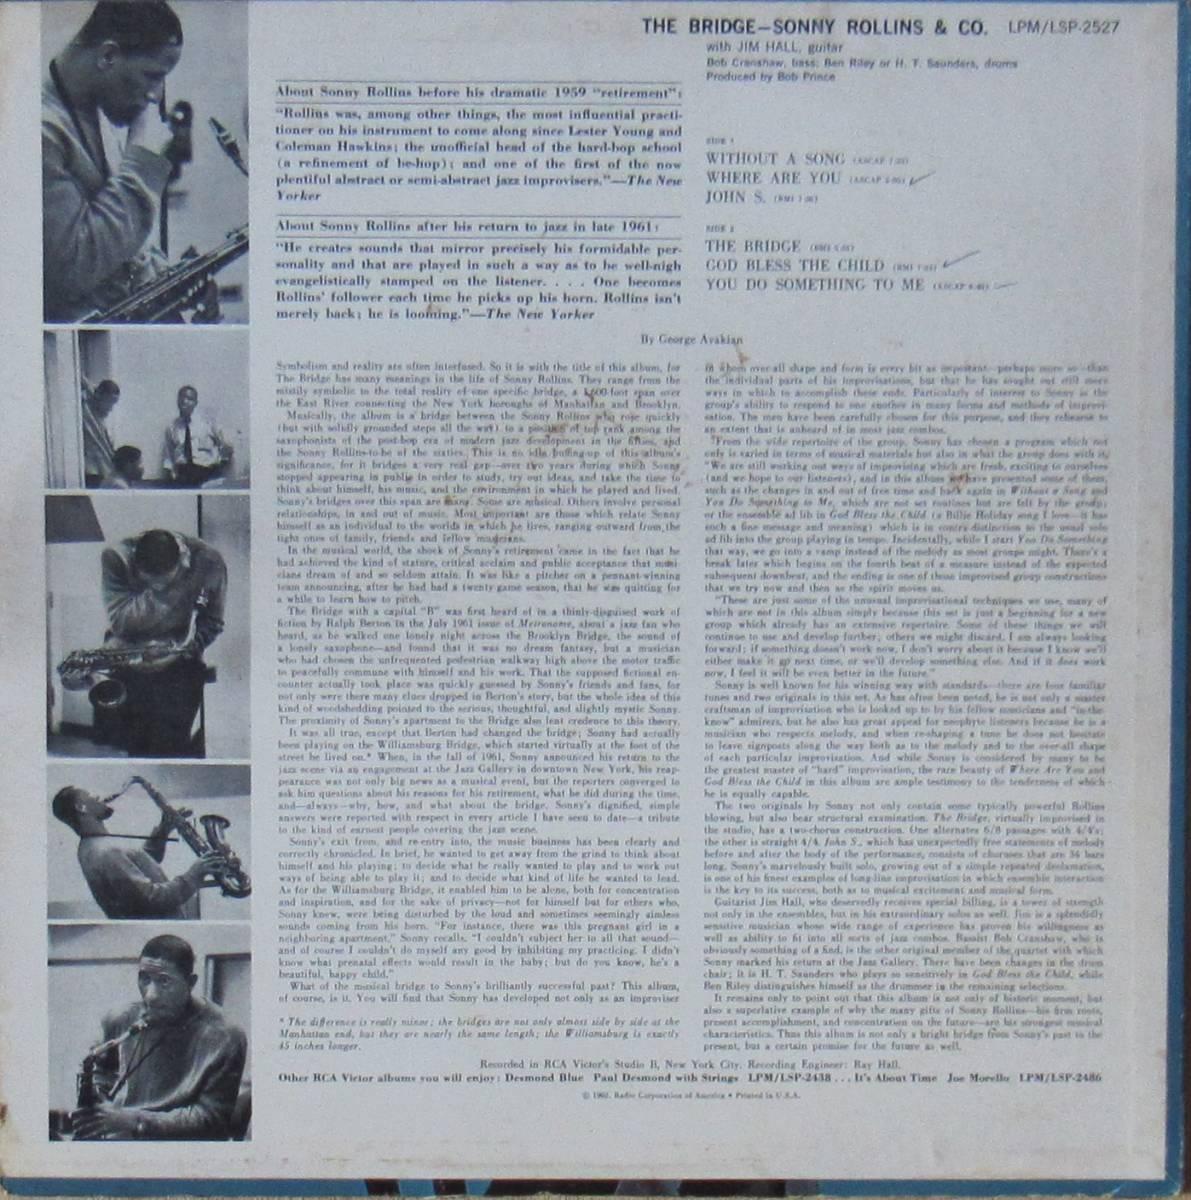 LP◆SONNY ROLLINS / The Bridge◆orig. mono DG_画像2